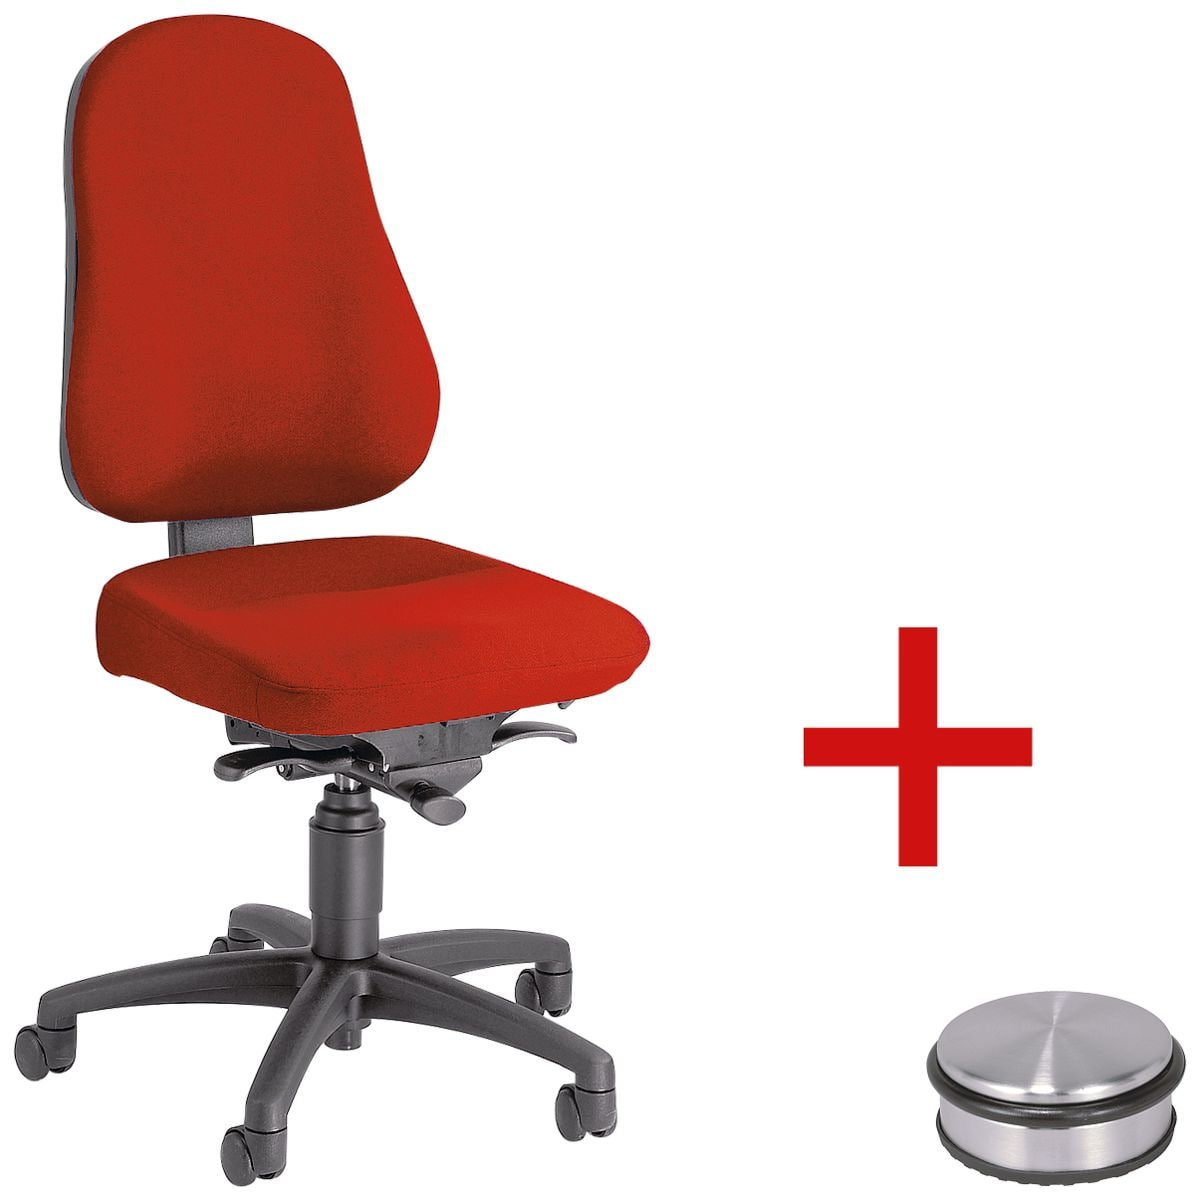 b rostuhl topstar balance 50 ohne armlehnen inkl t rstopper disc bei otto office g nstig. Black Bedroom Furniture Sets. Home Design Ideas